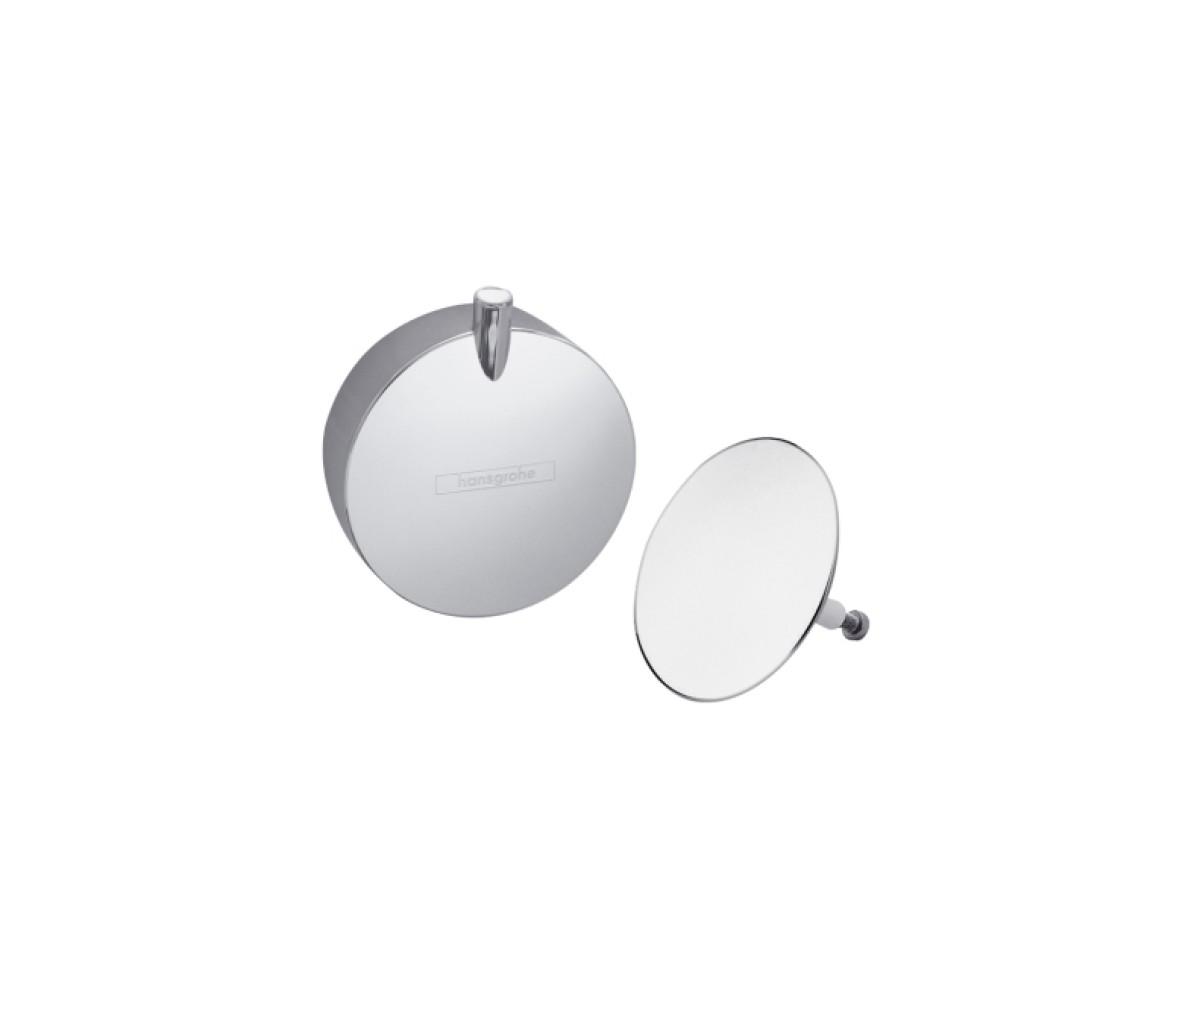 Сифон для ванны HANSGROHE Flexaplus S (58186000)